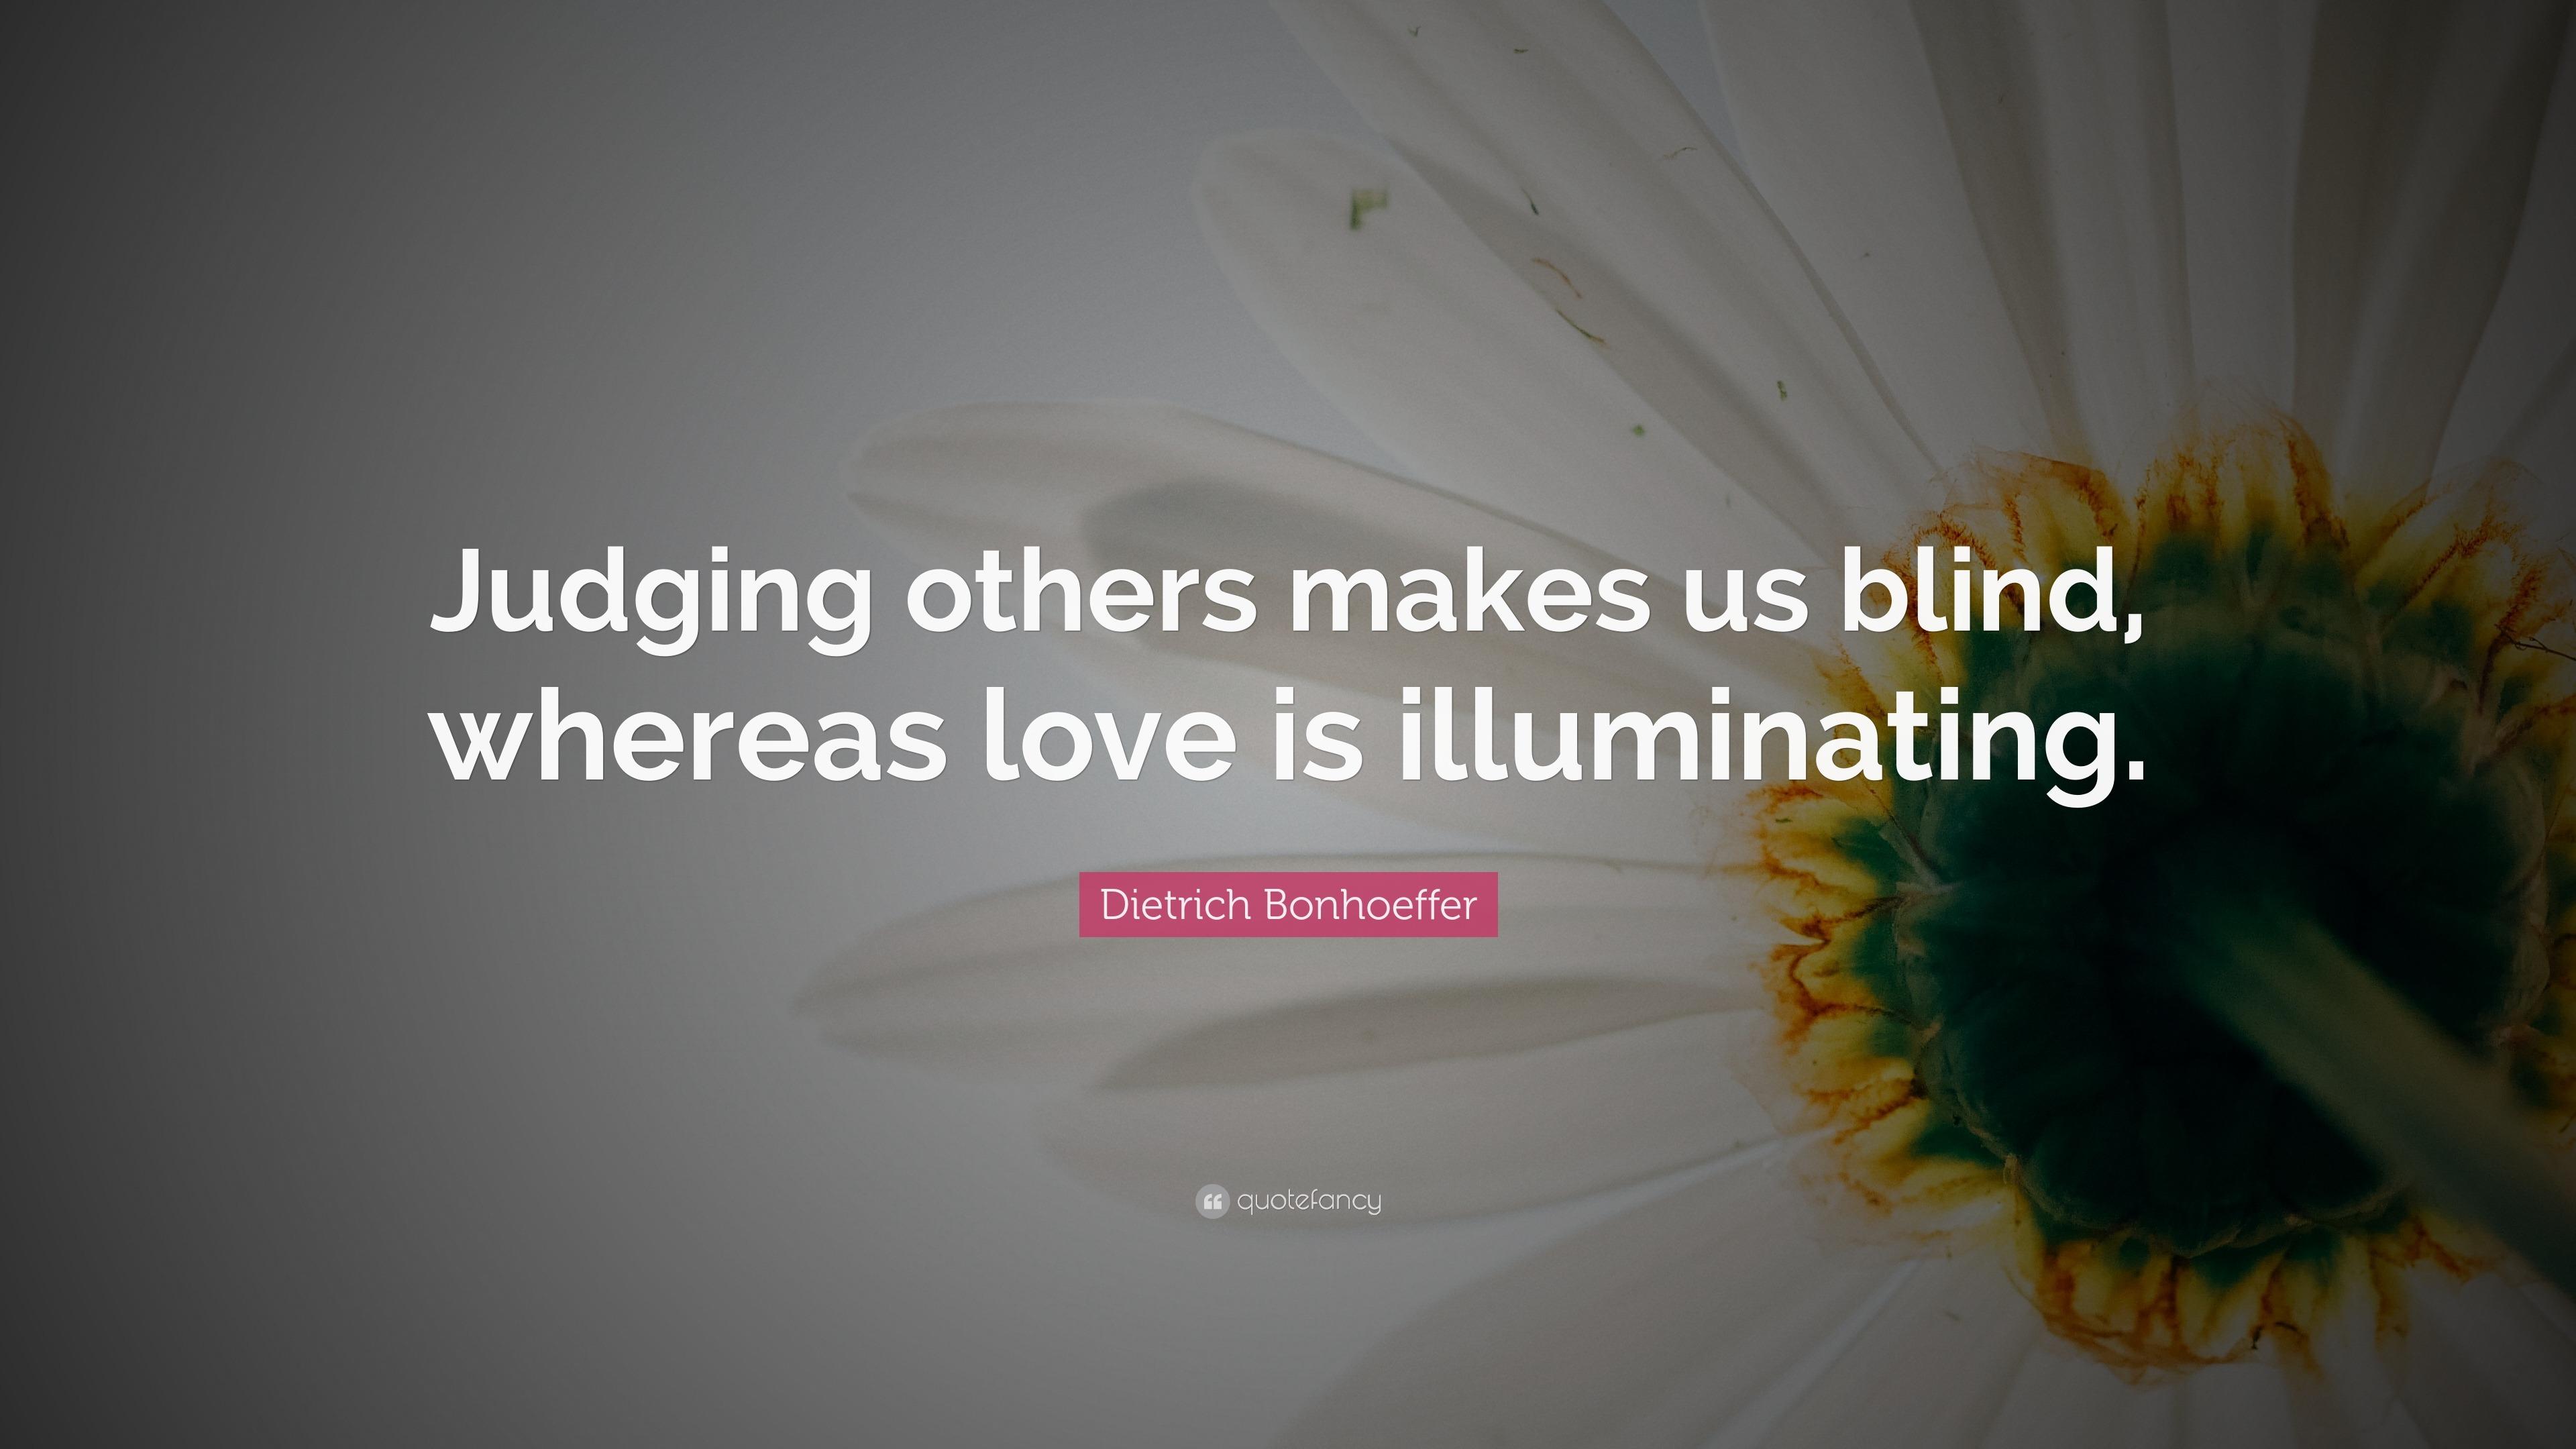 Dietrich Bonhoeffer Quotes (100 Wallpapers)